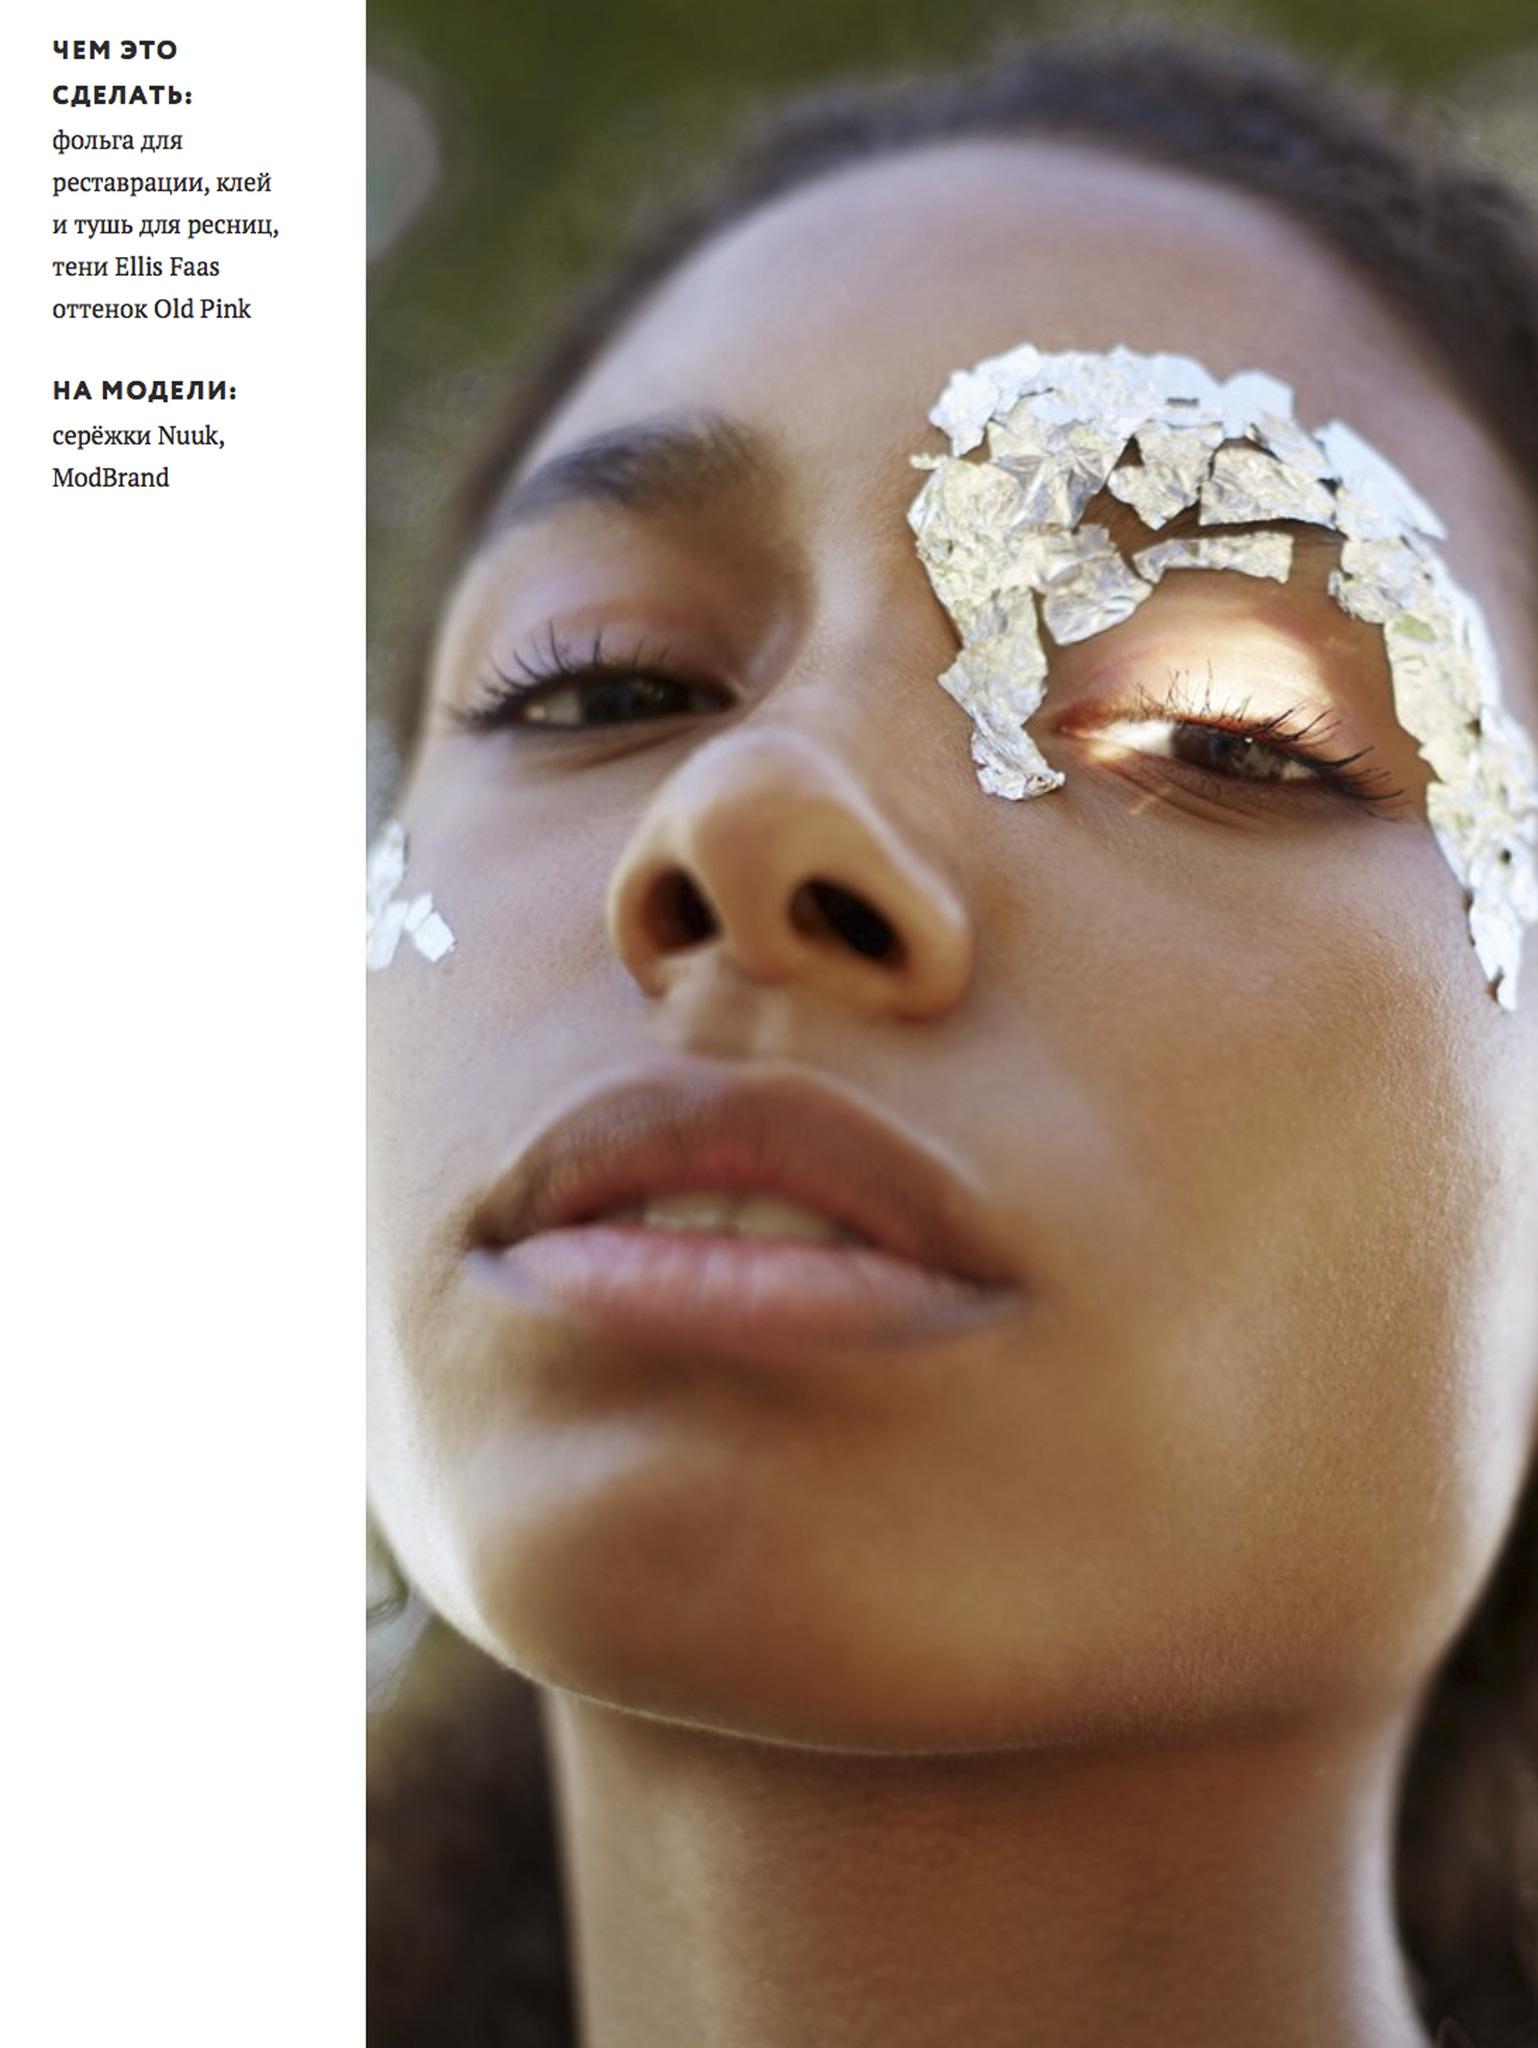 Серьги Paint Line Silver от NUUK в съемке Wonderzine